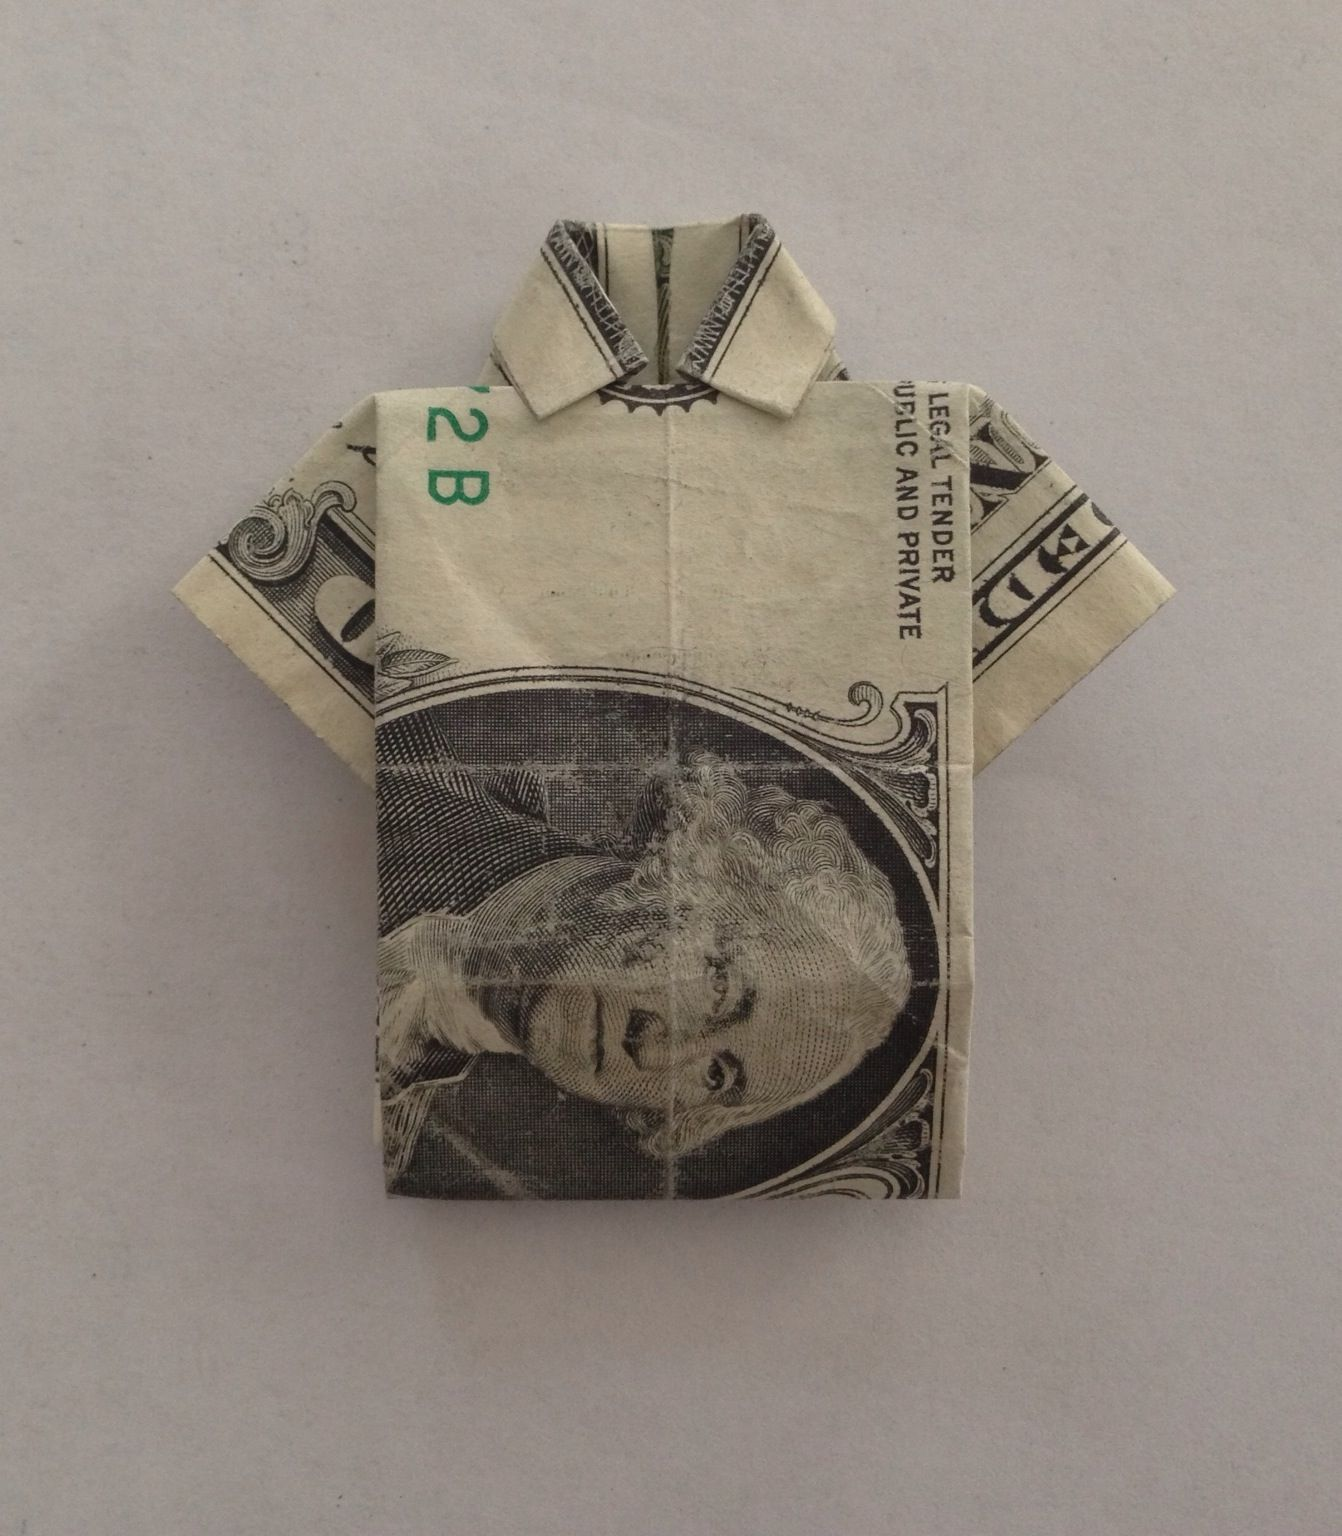 How to Fold Dollar/any Bill Into a Shirt - Origami | Arts ... - photo#46